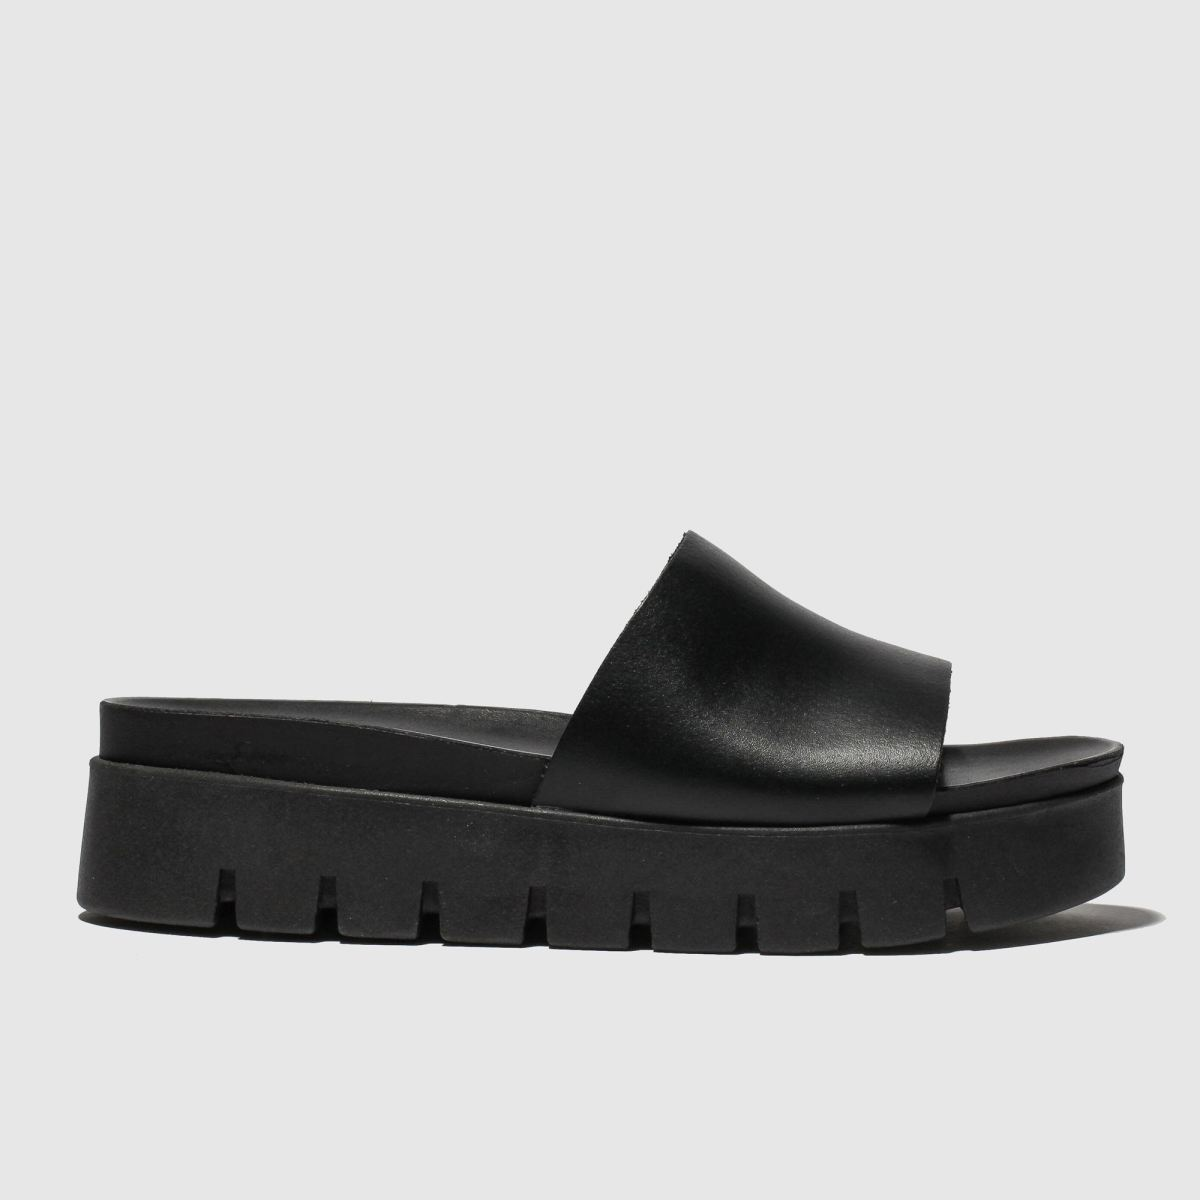 schuh Schuh Black Faro Sandals